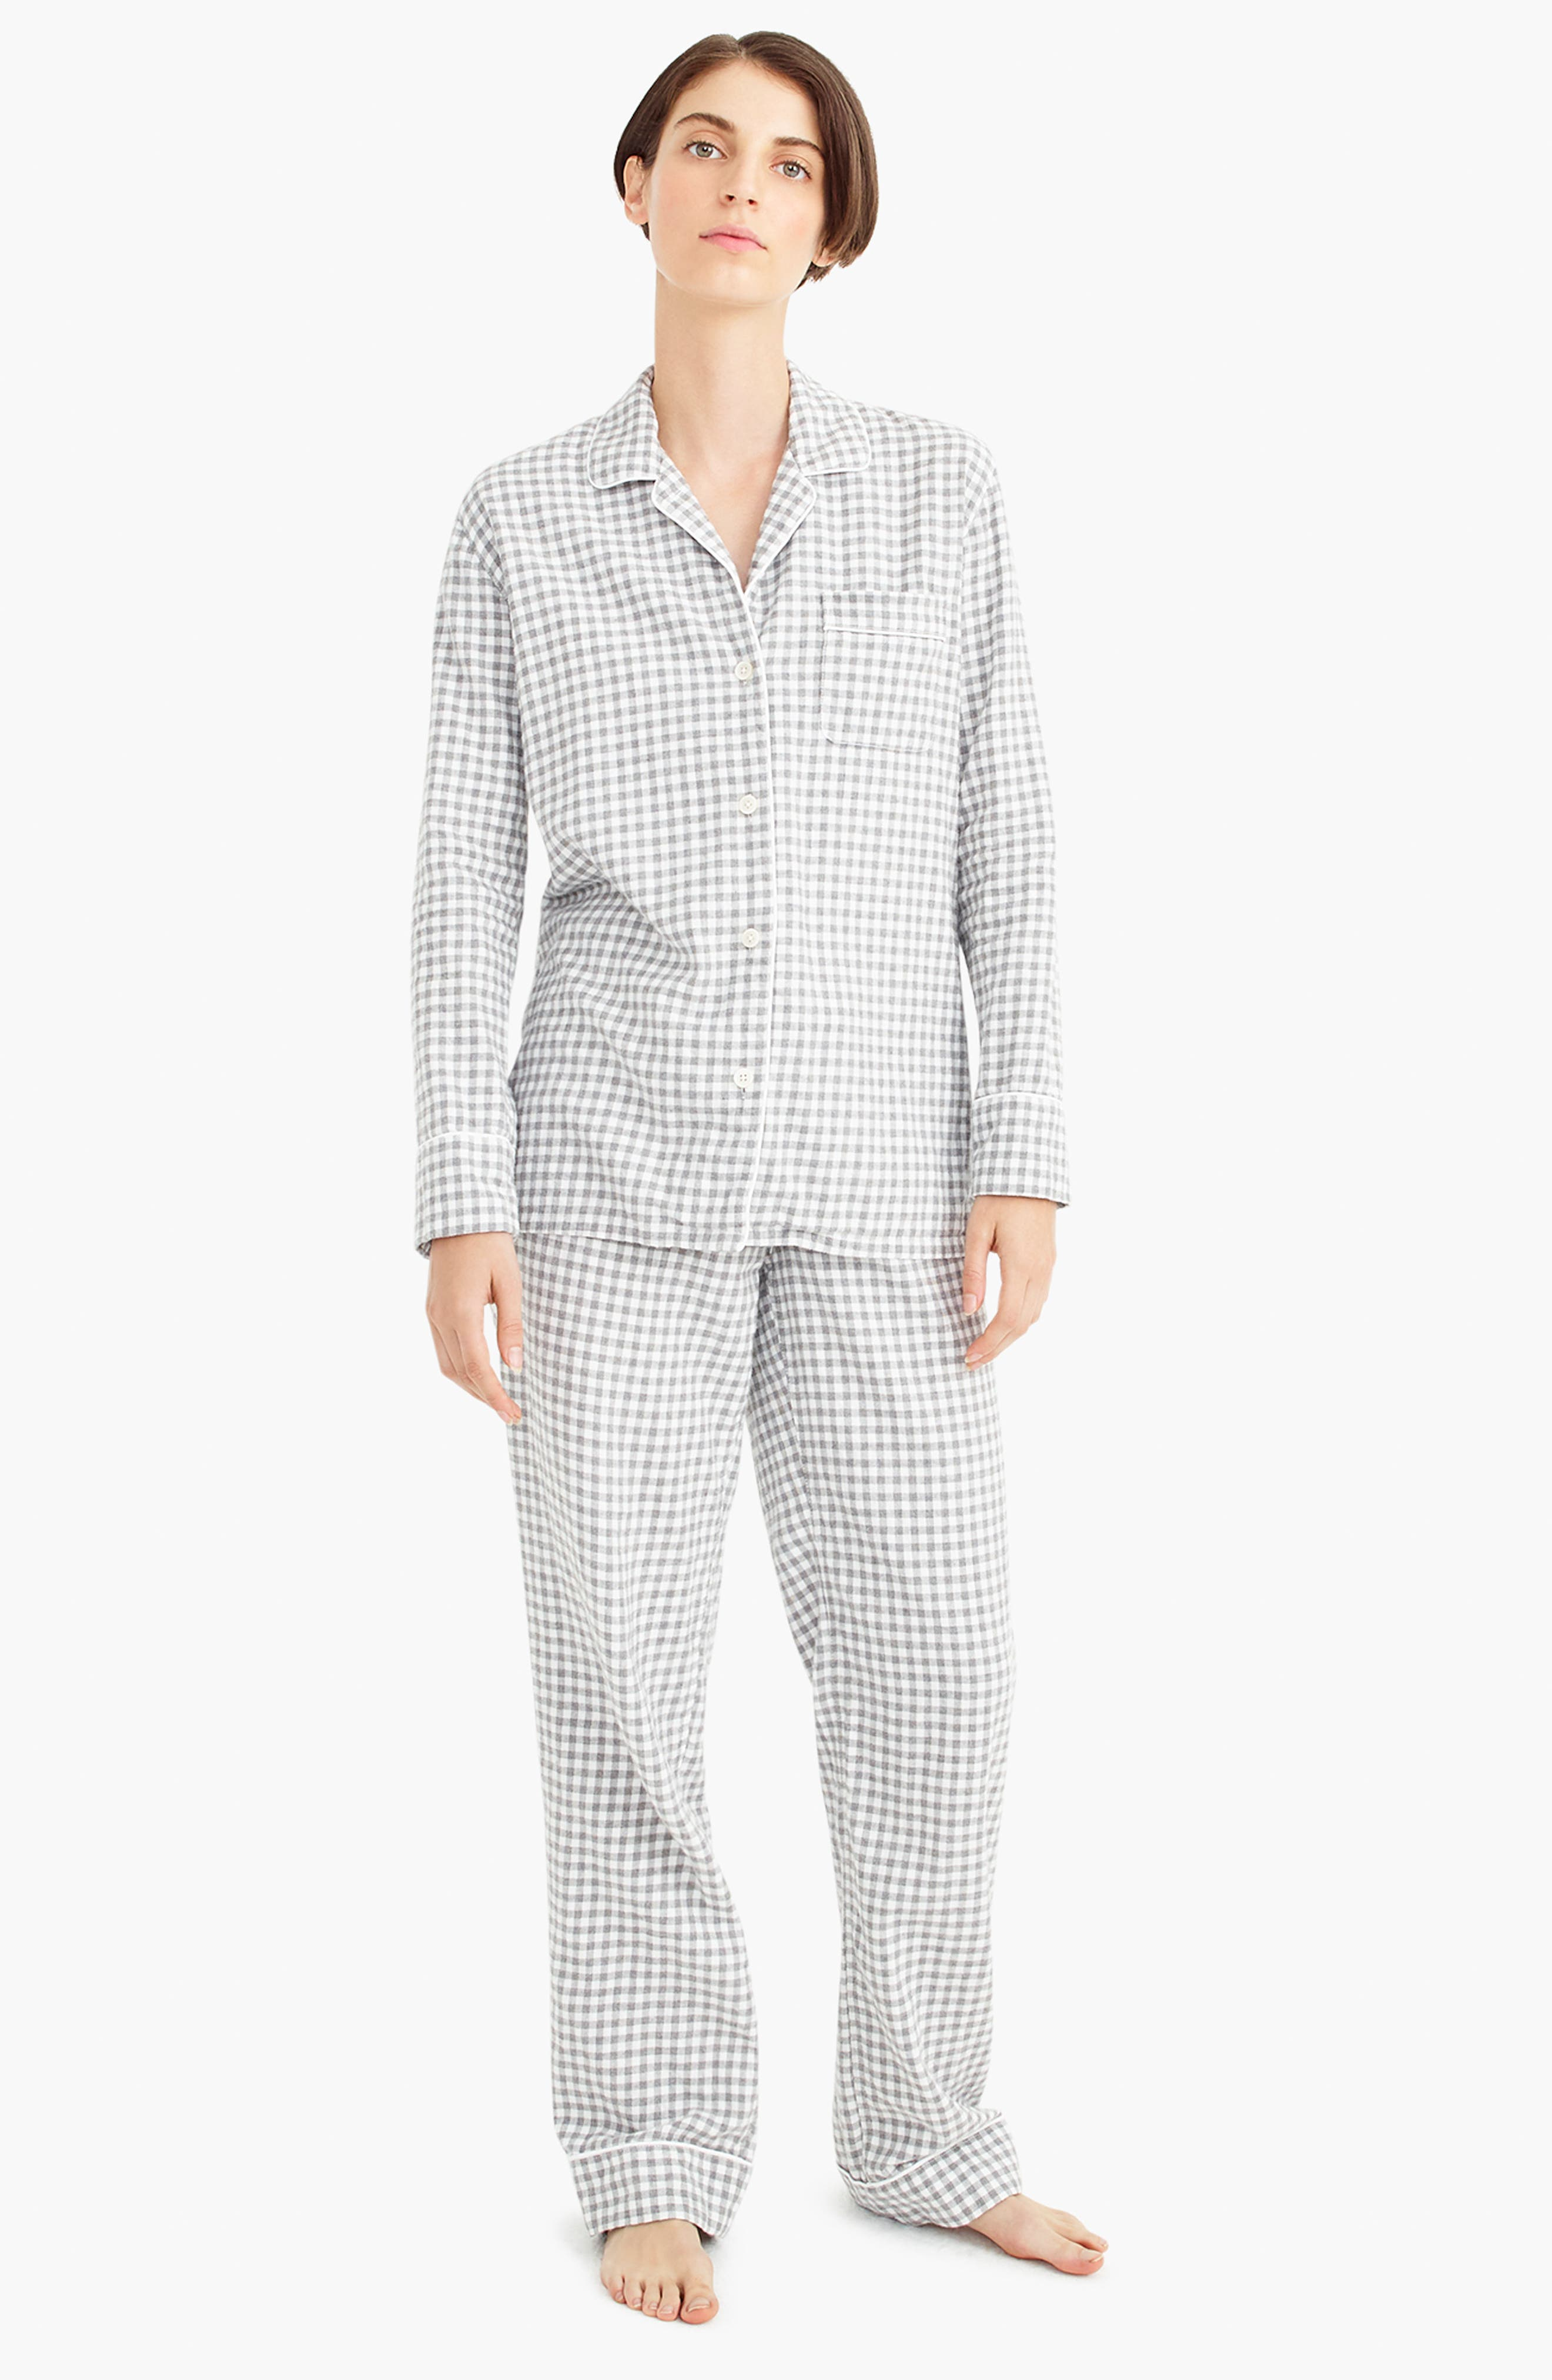 Gingham Flannel Pajamas,                             Alternate thumbnail 6, color,                             090